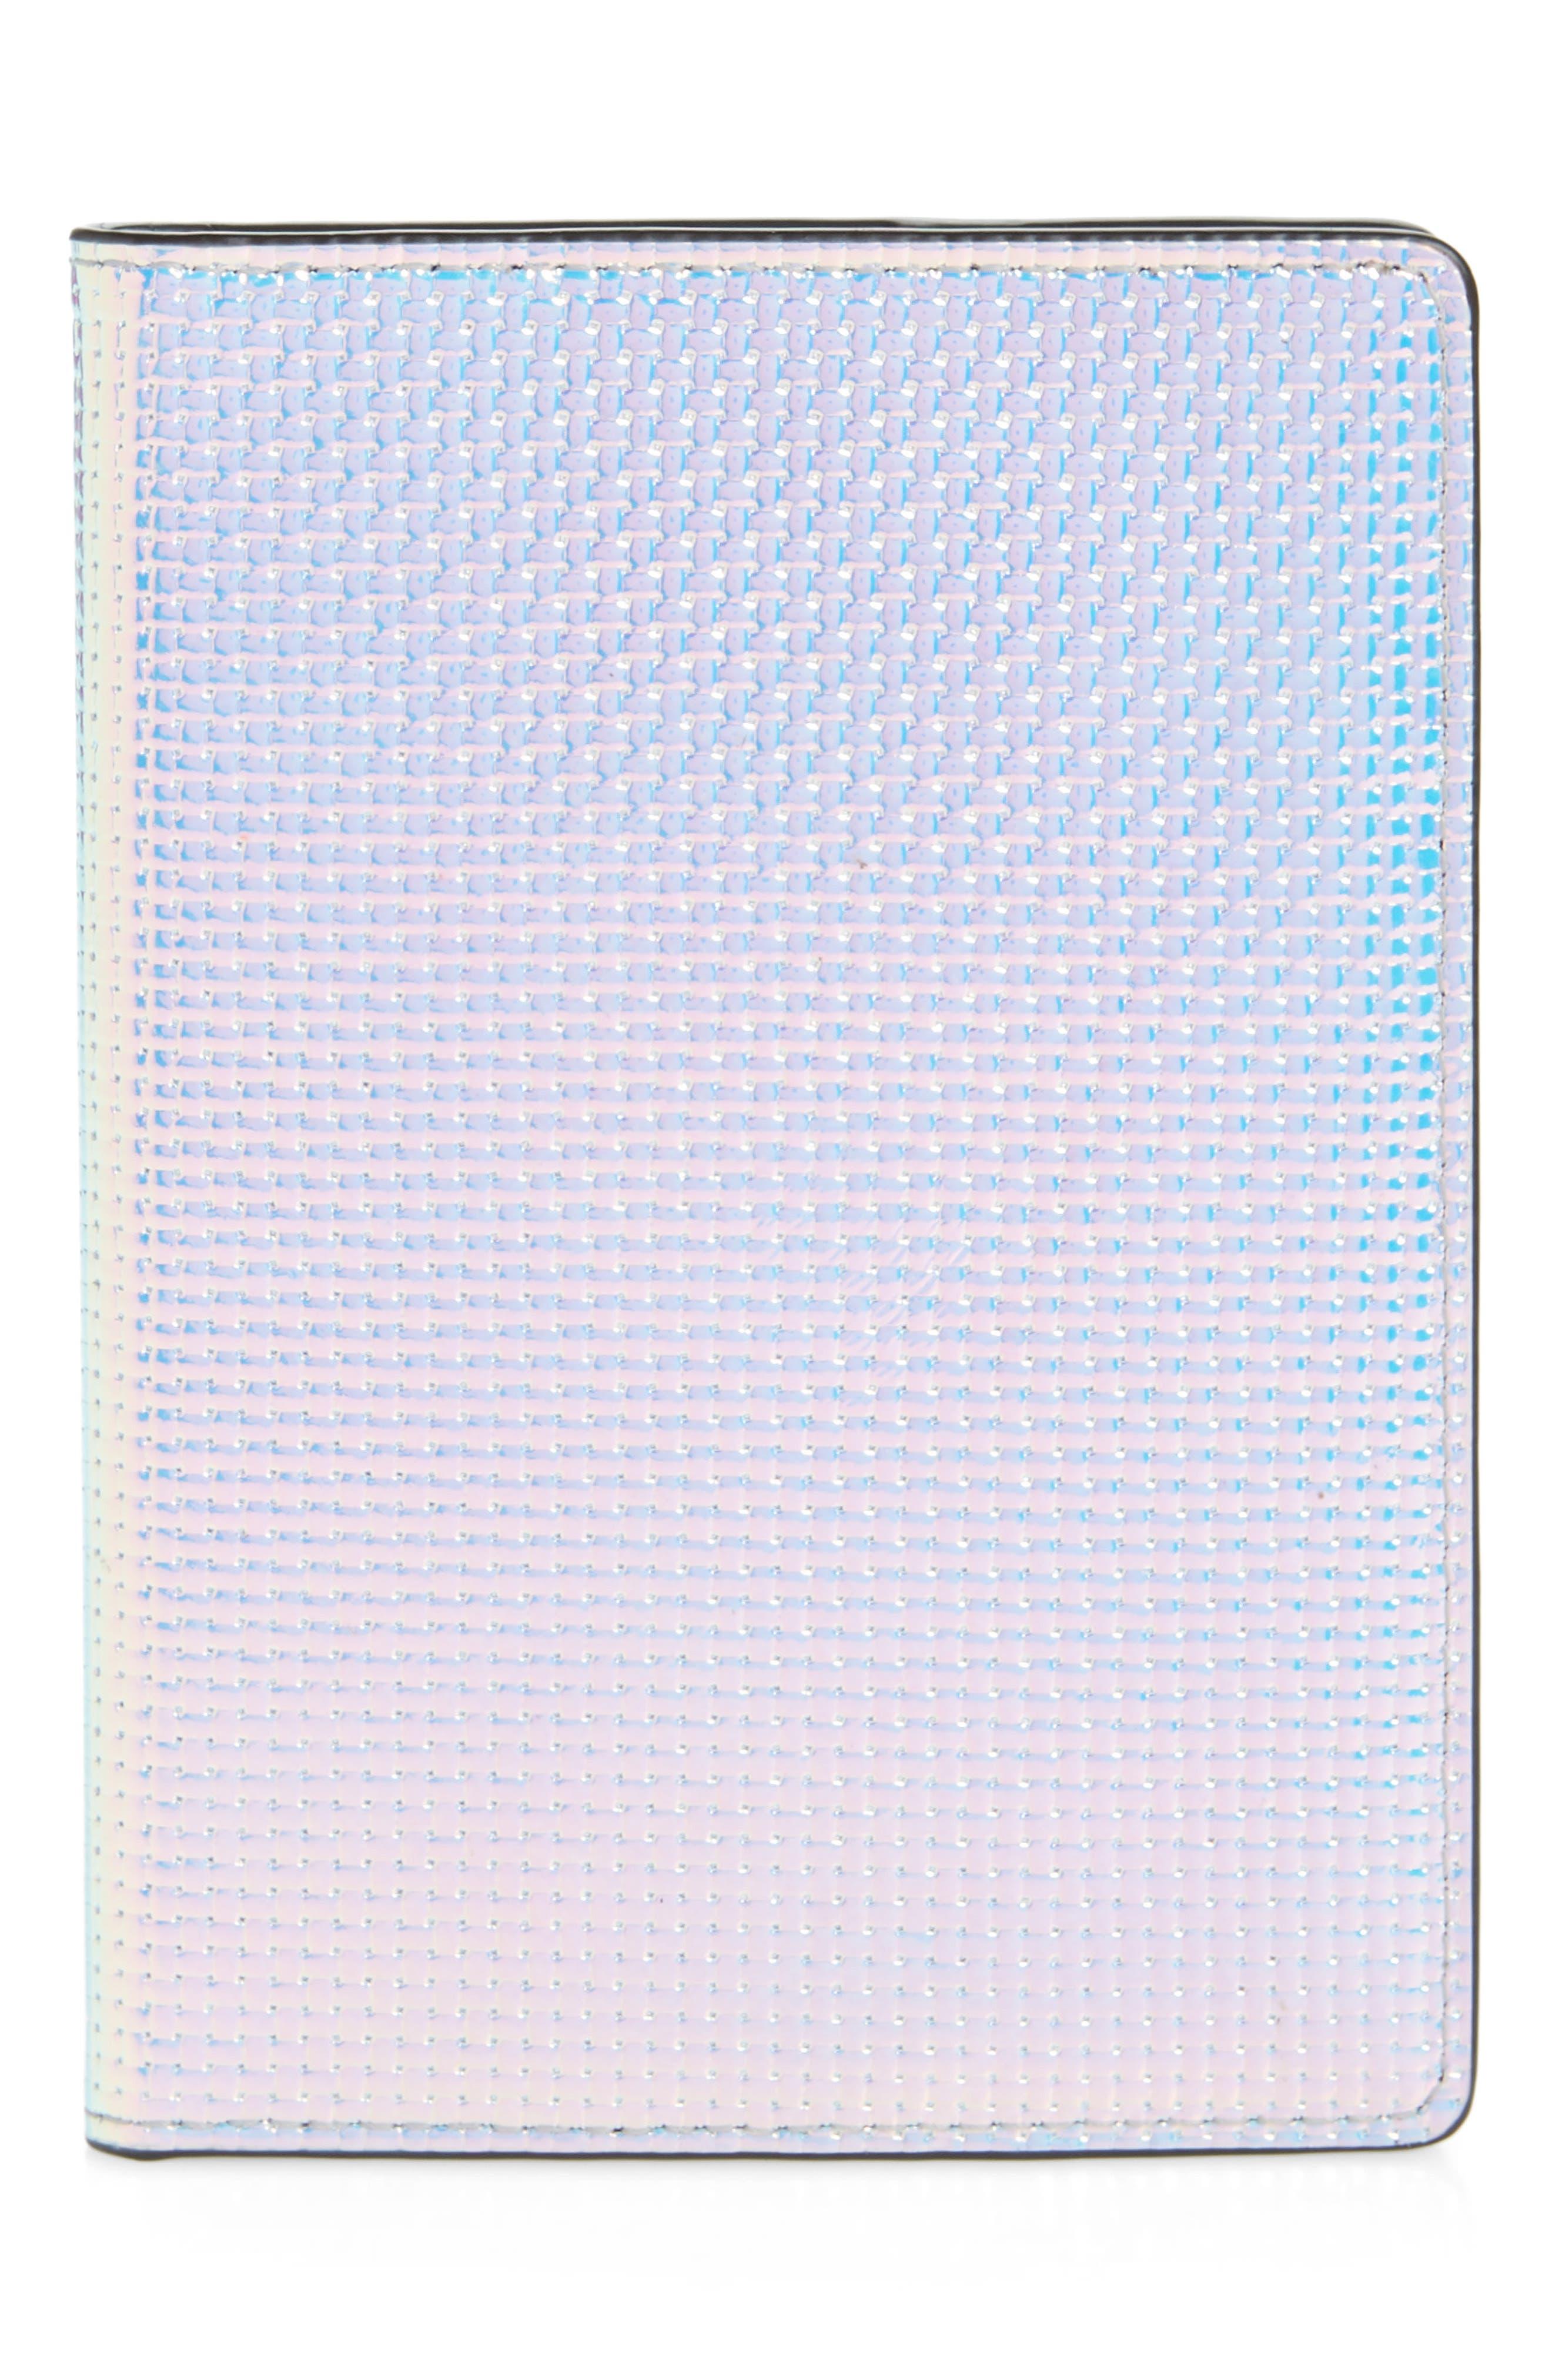 REBECCA MINKOFF Iridescent Passport Case, Main, color, OPAL IRIDESCENT